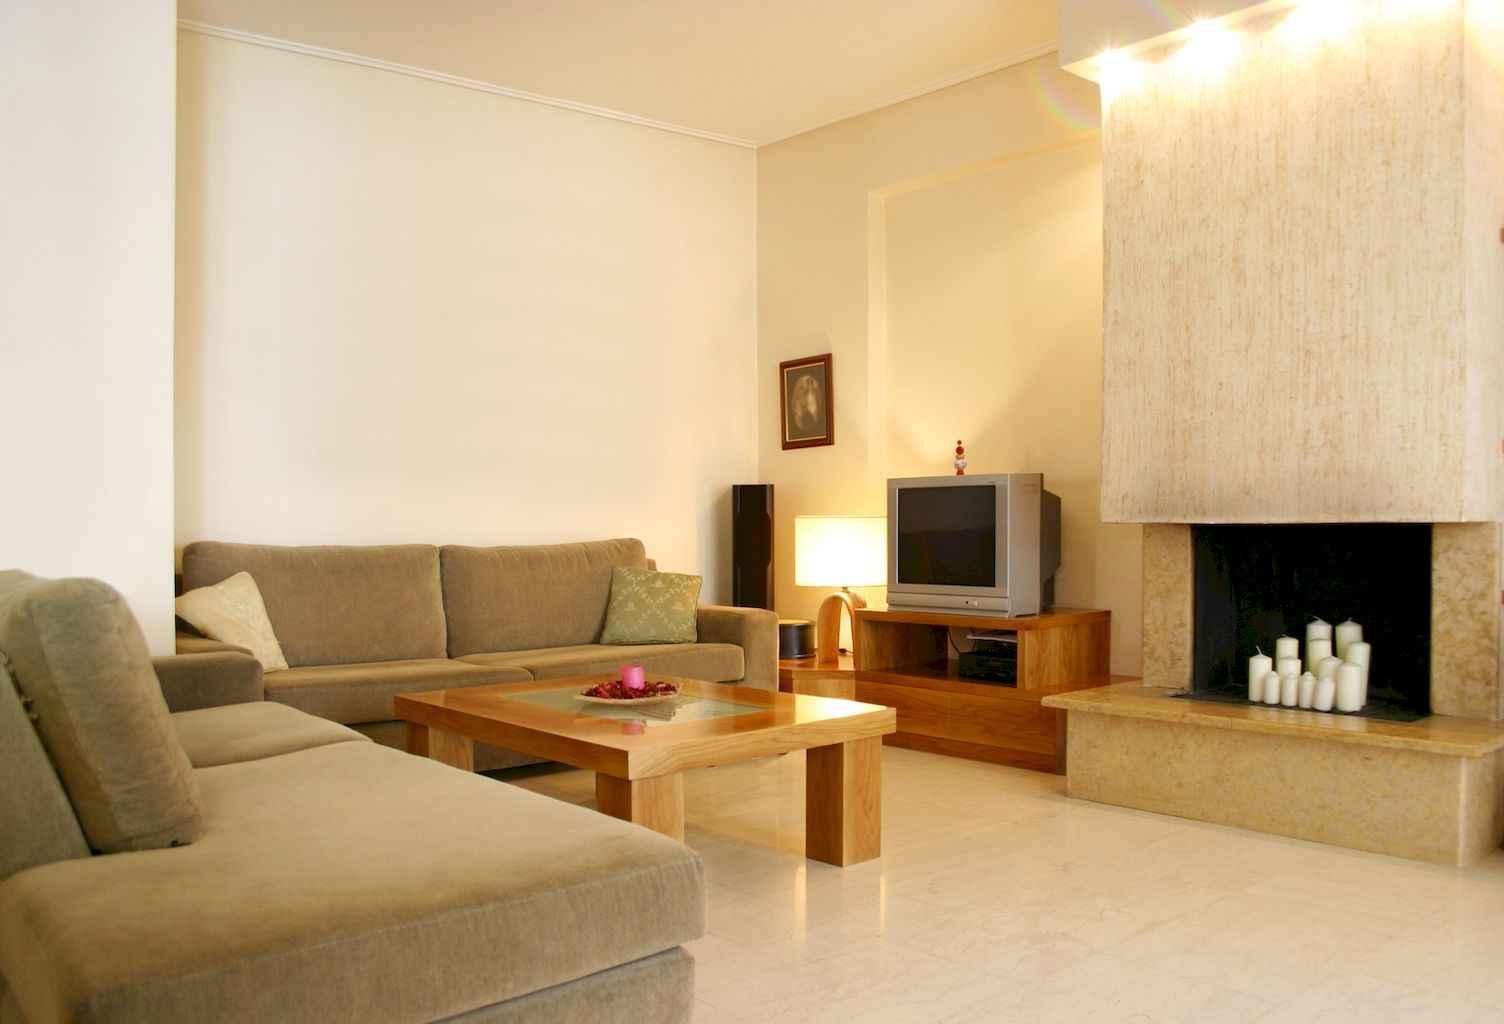 80 Elegant Harmony Interior Design Ideas For First Couple (38)